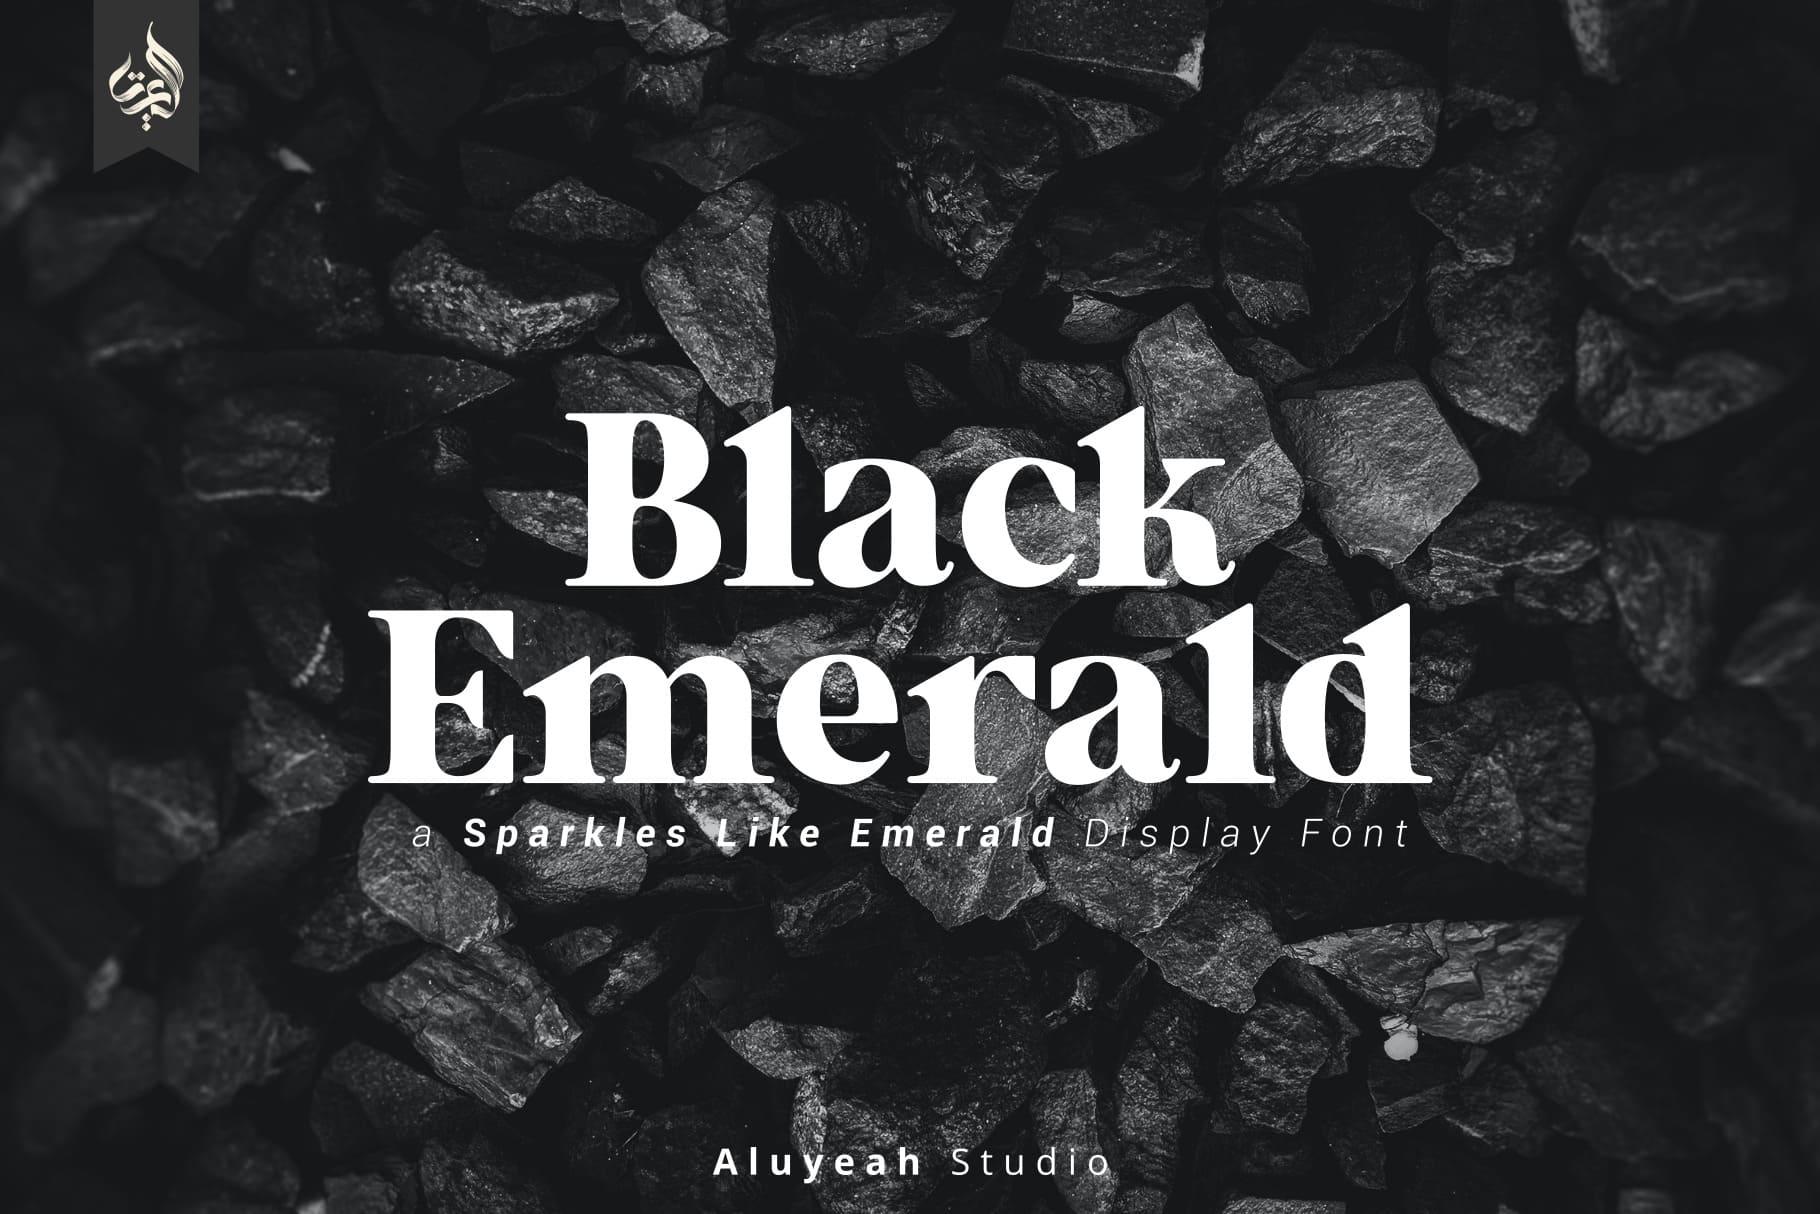 Black Emerald